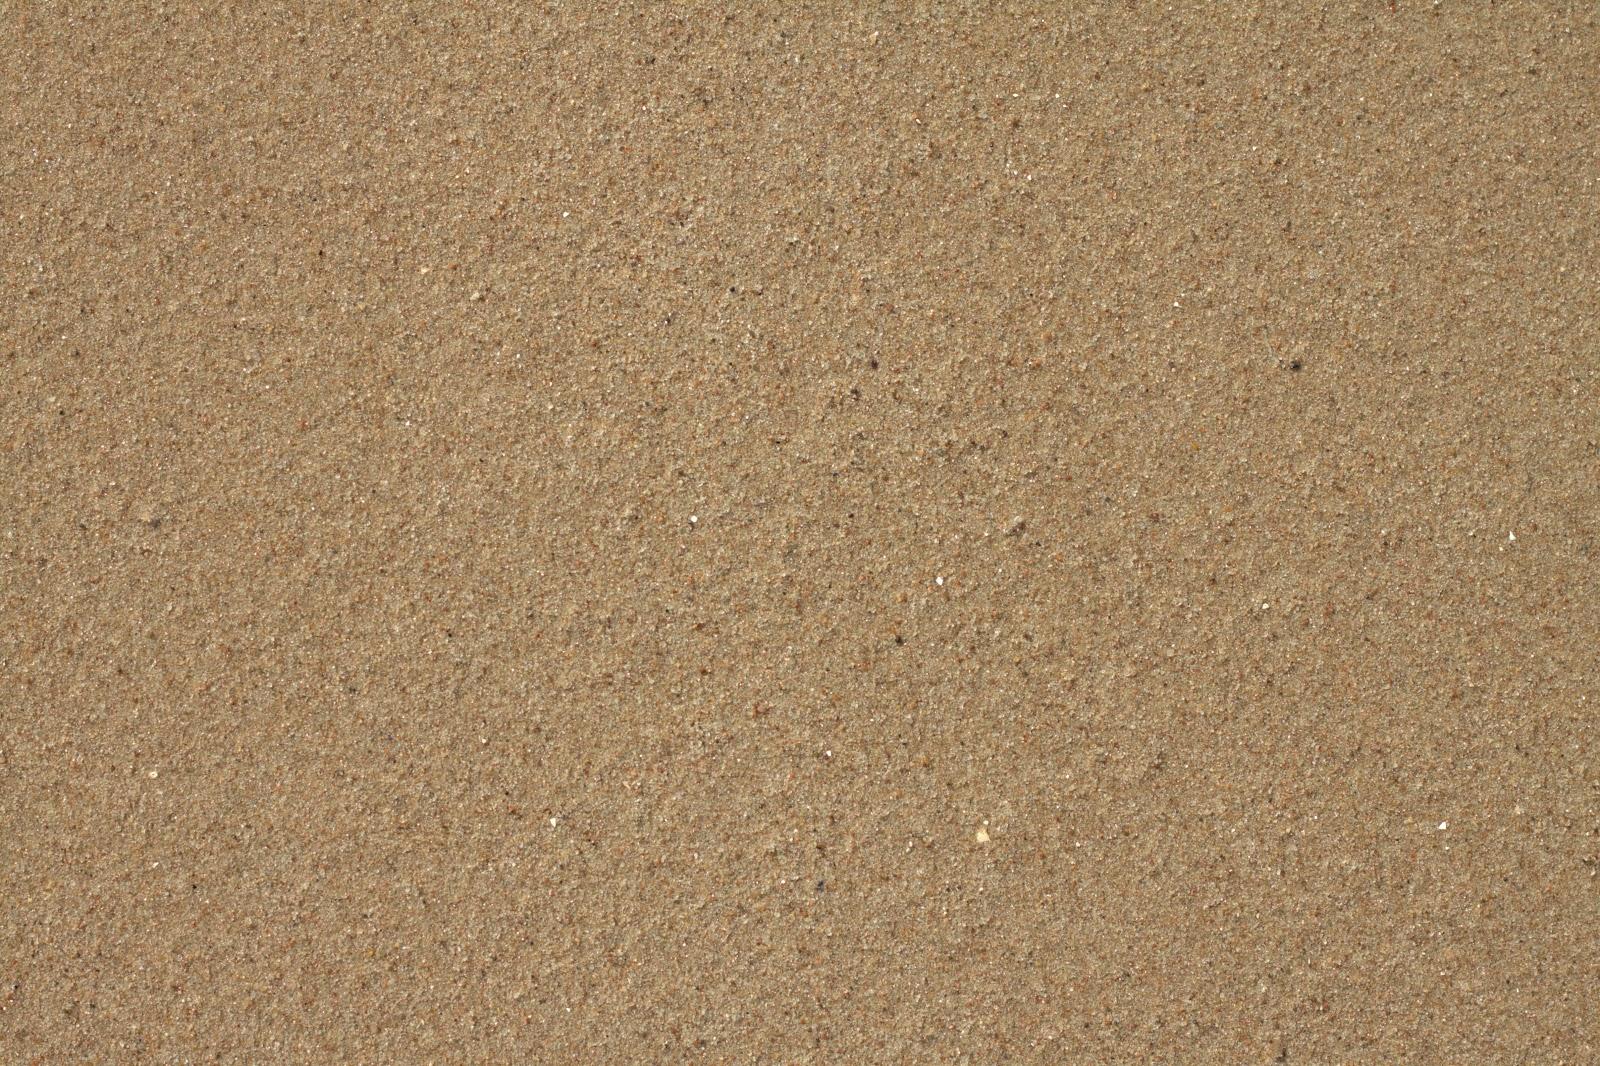 High Resolution Seamless Textures Sand 3 Beach Soil